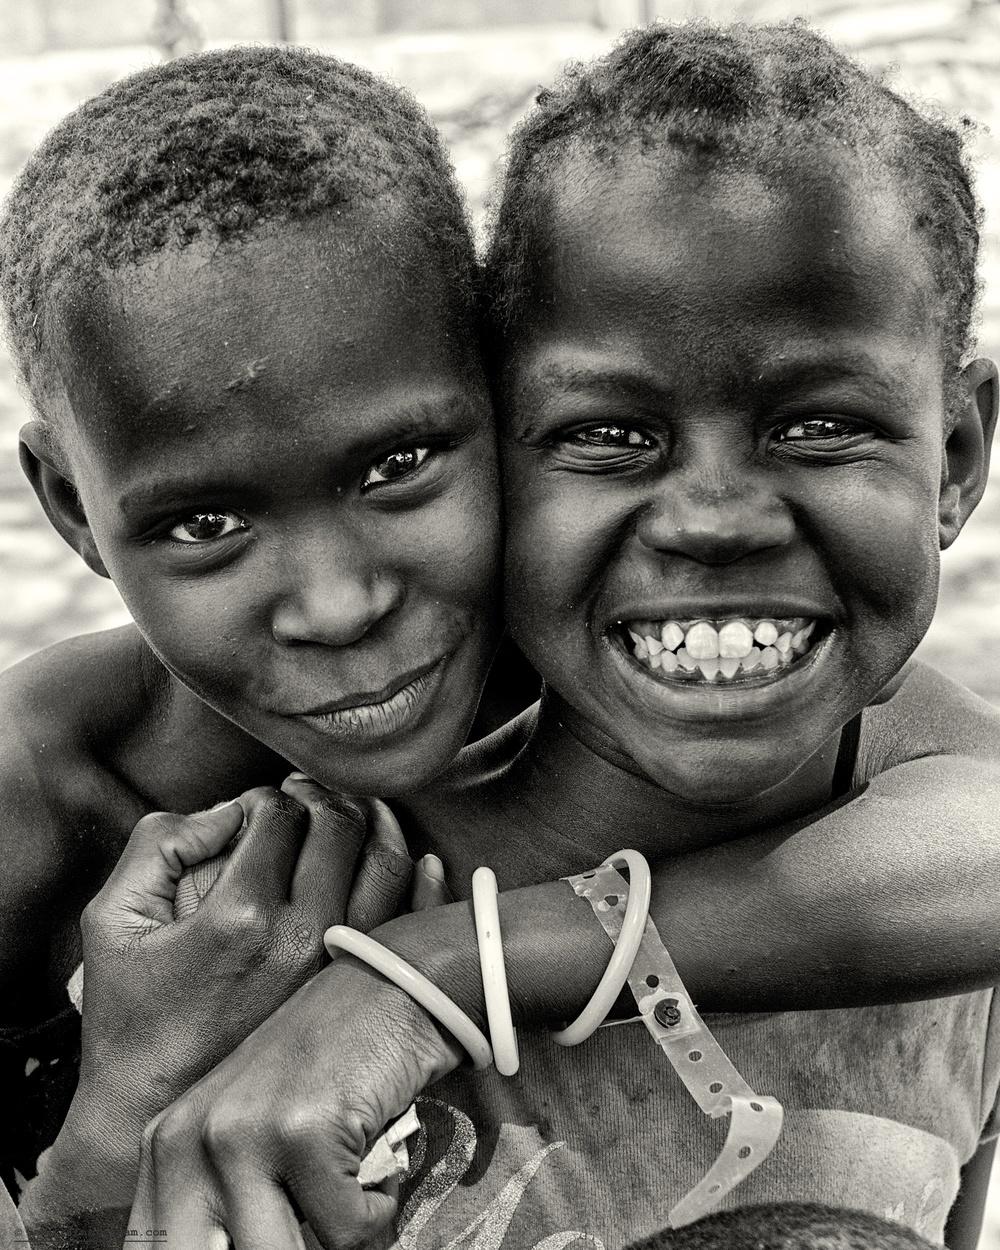 refugee portraits uganda 9.jpg